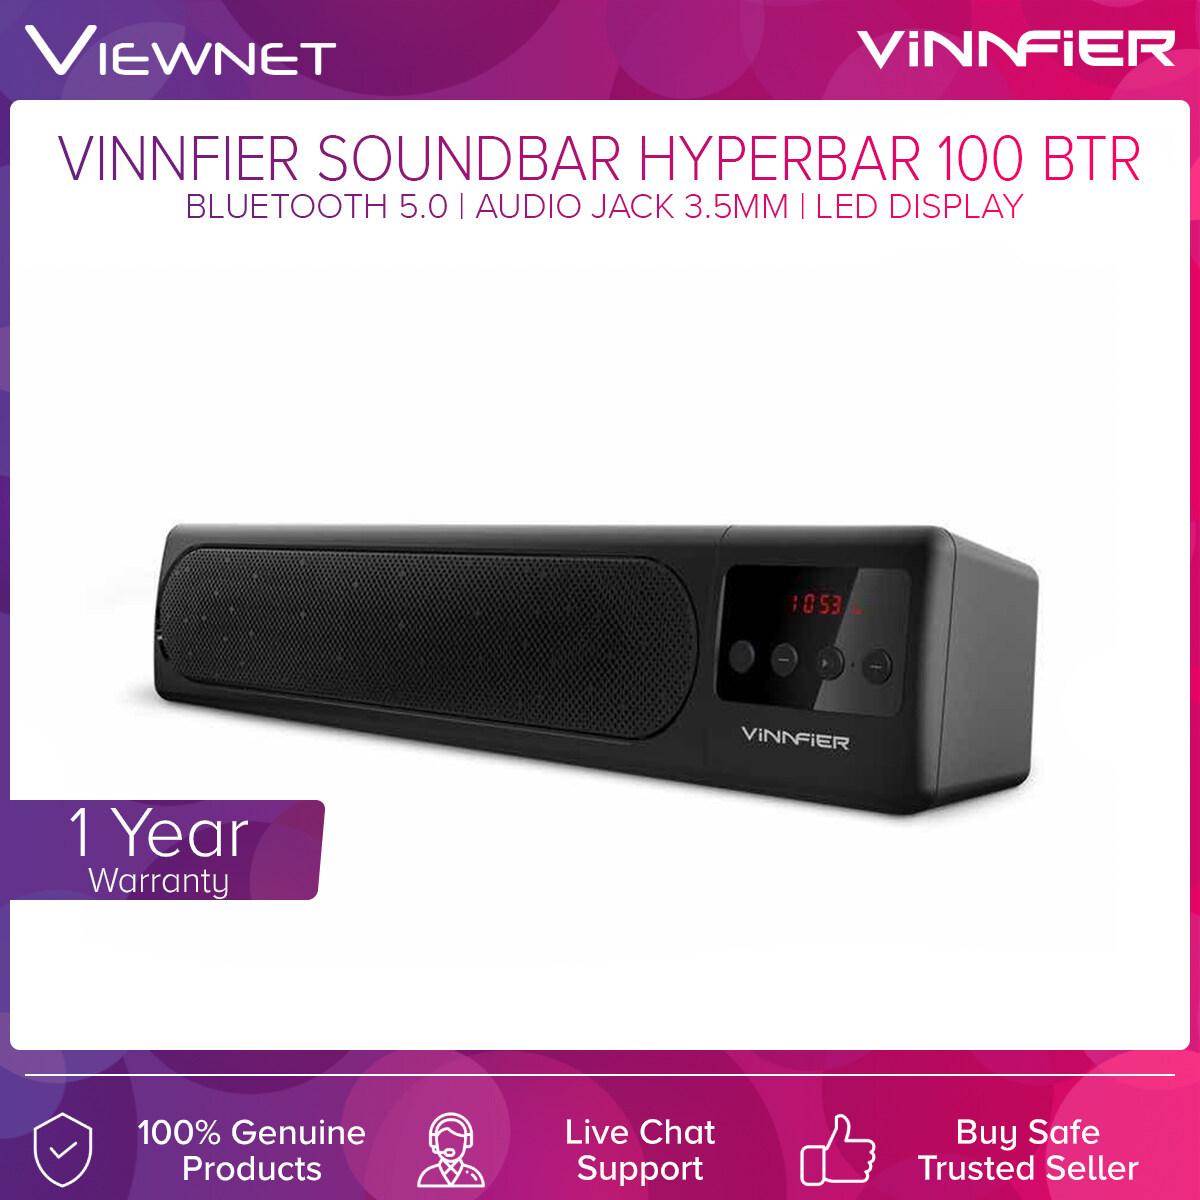 Vinnfier Wireless Soundbar Hyperbar 100 BTR with Bluetooth 5.0, FM Radio, USB and SD Card Slot, LED Display, Audio Jack 3.5MM Support